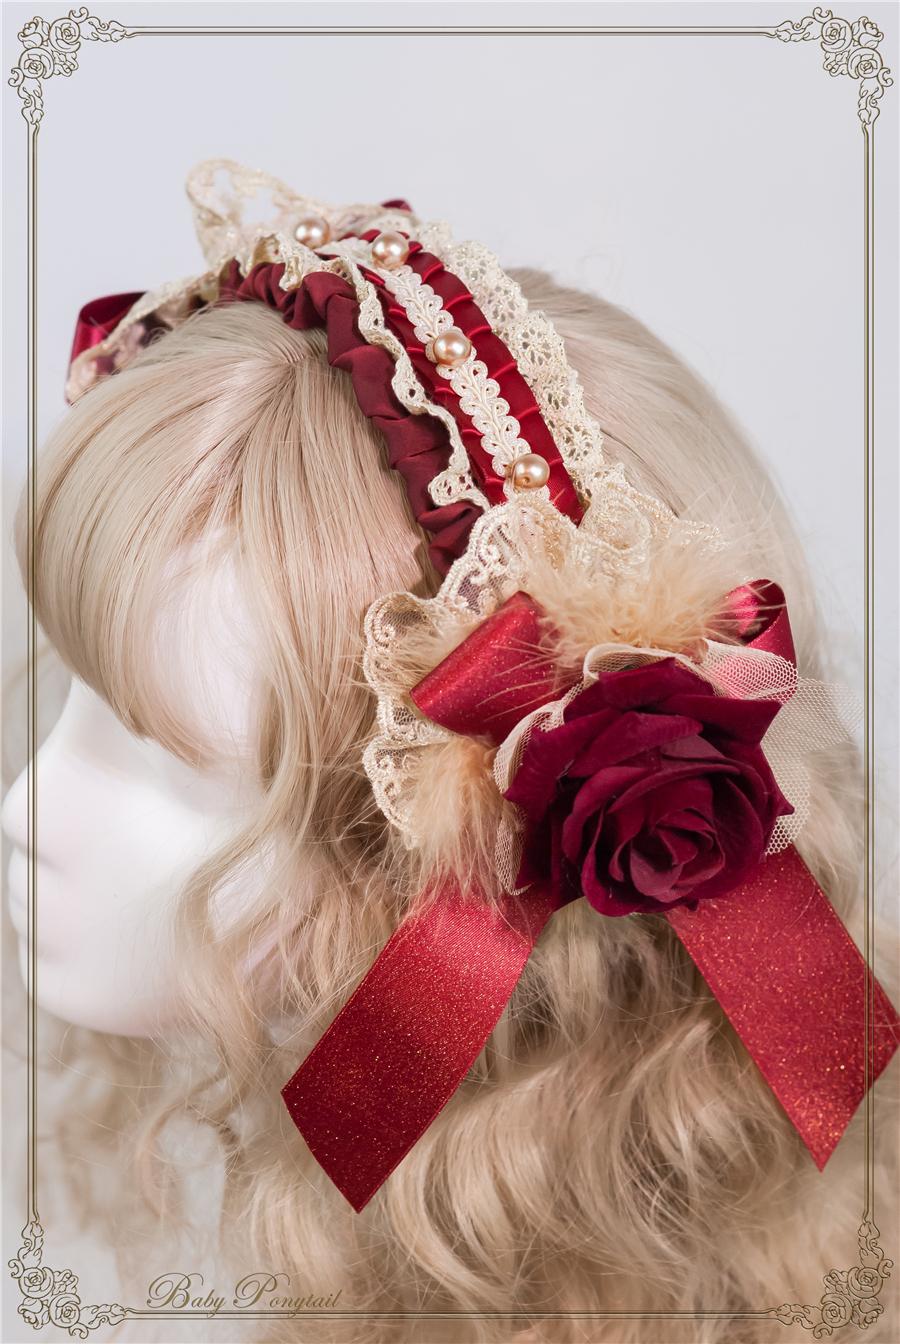 Baby Ponytail_Stock photo_Circus Princess_Rose Head Dress Red_04.jpg